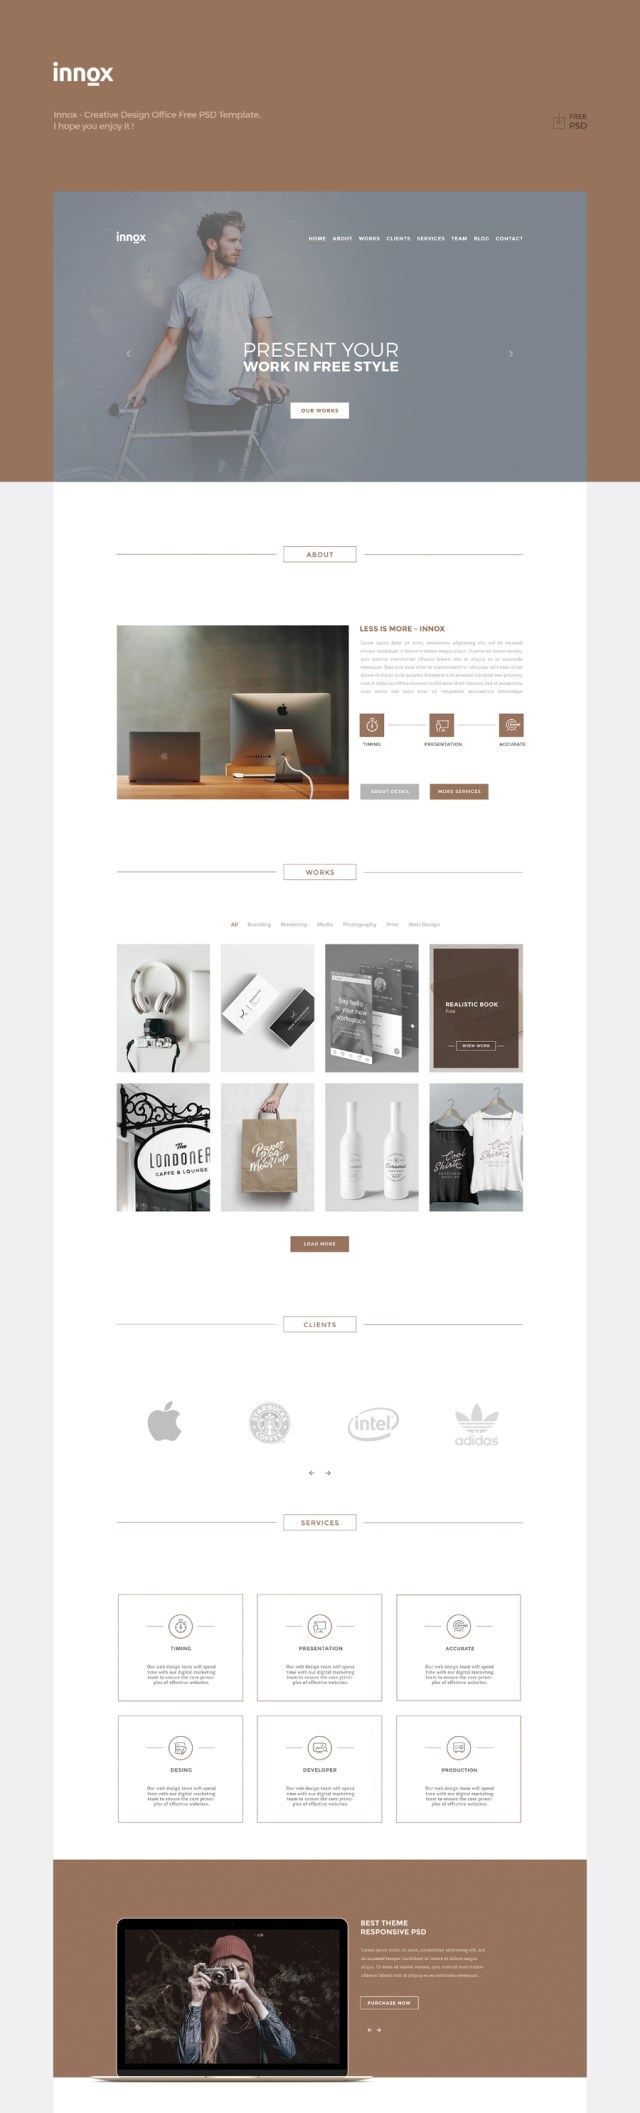 Innox Free Creative Design Office